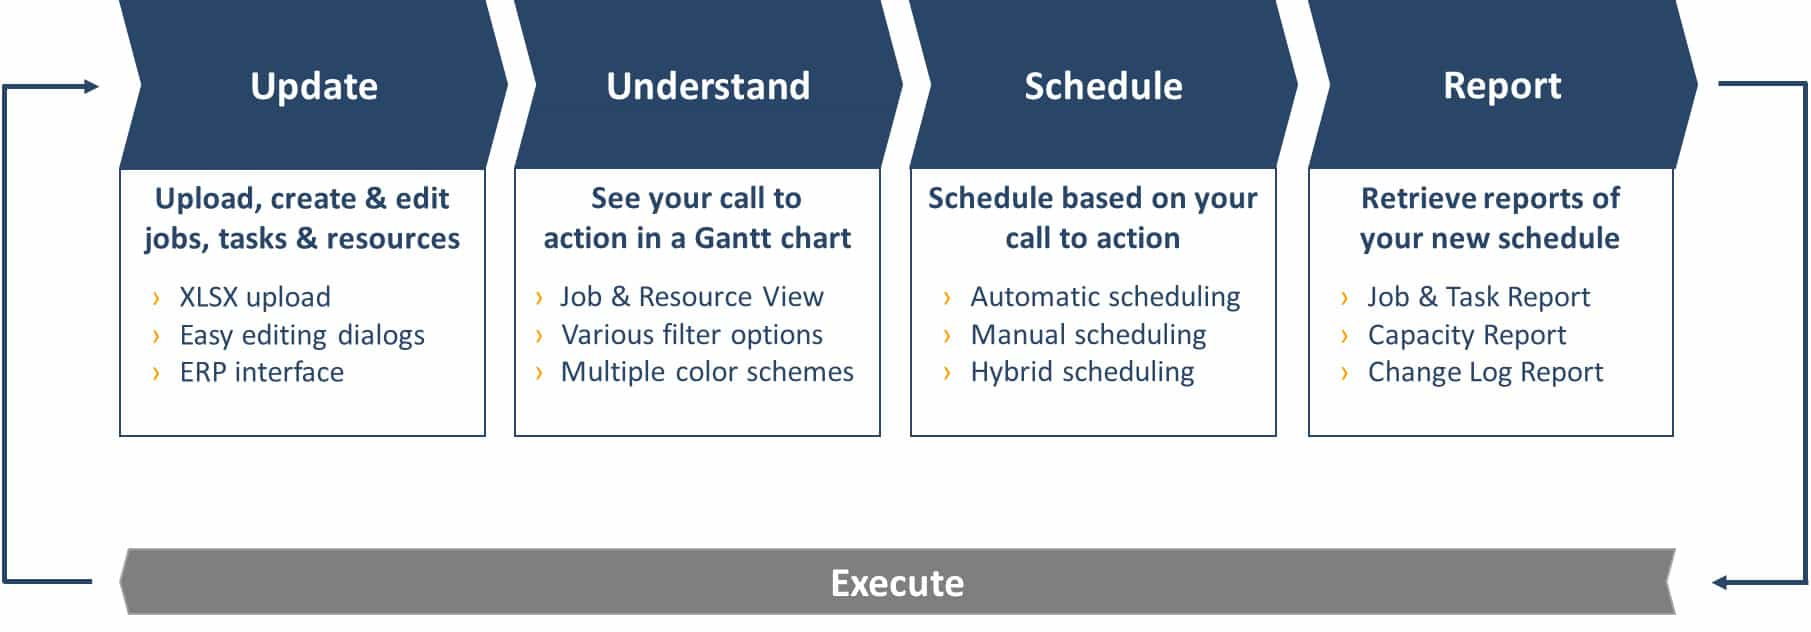 Update Understand Schedule Report Execute - transparent background-min (2).jpg